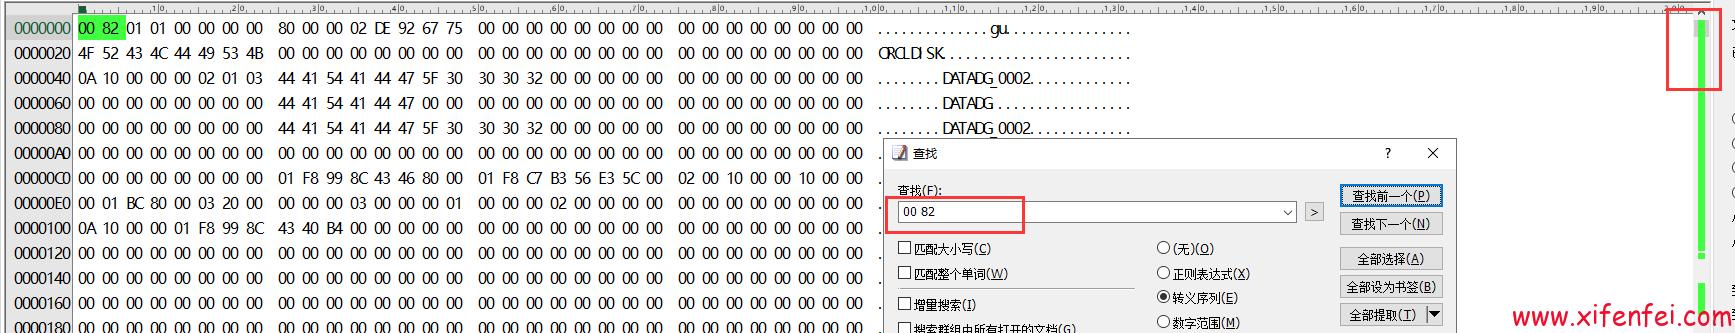 0082-good